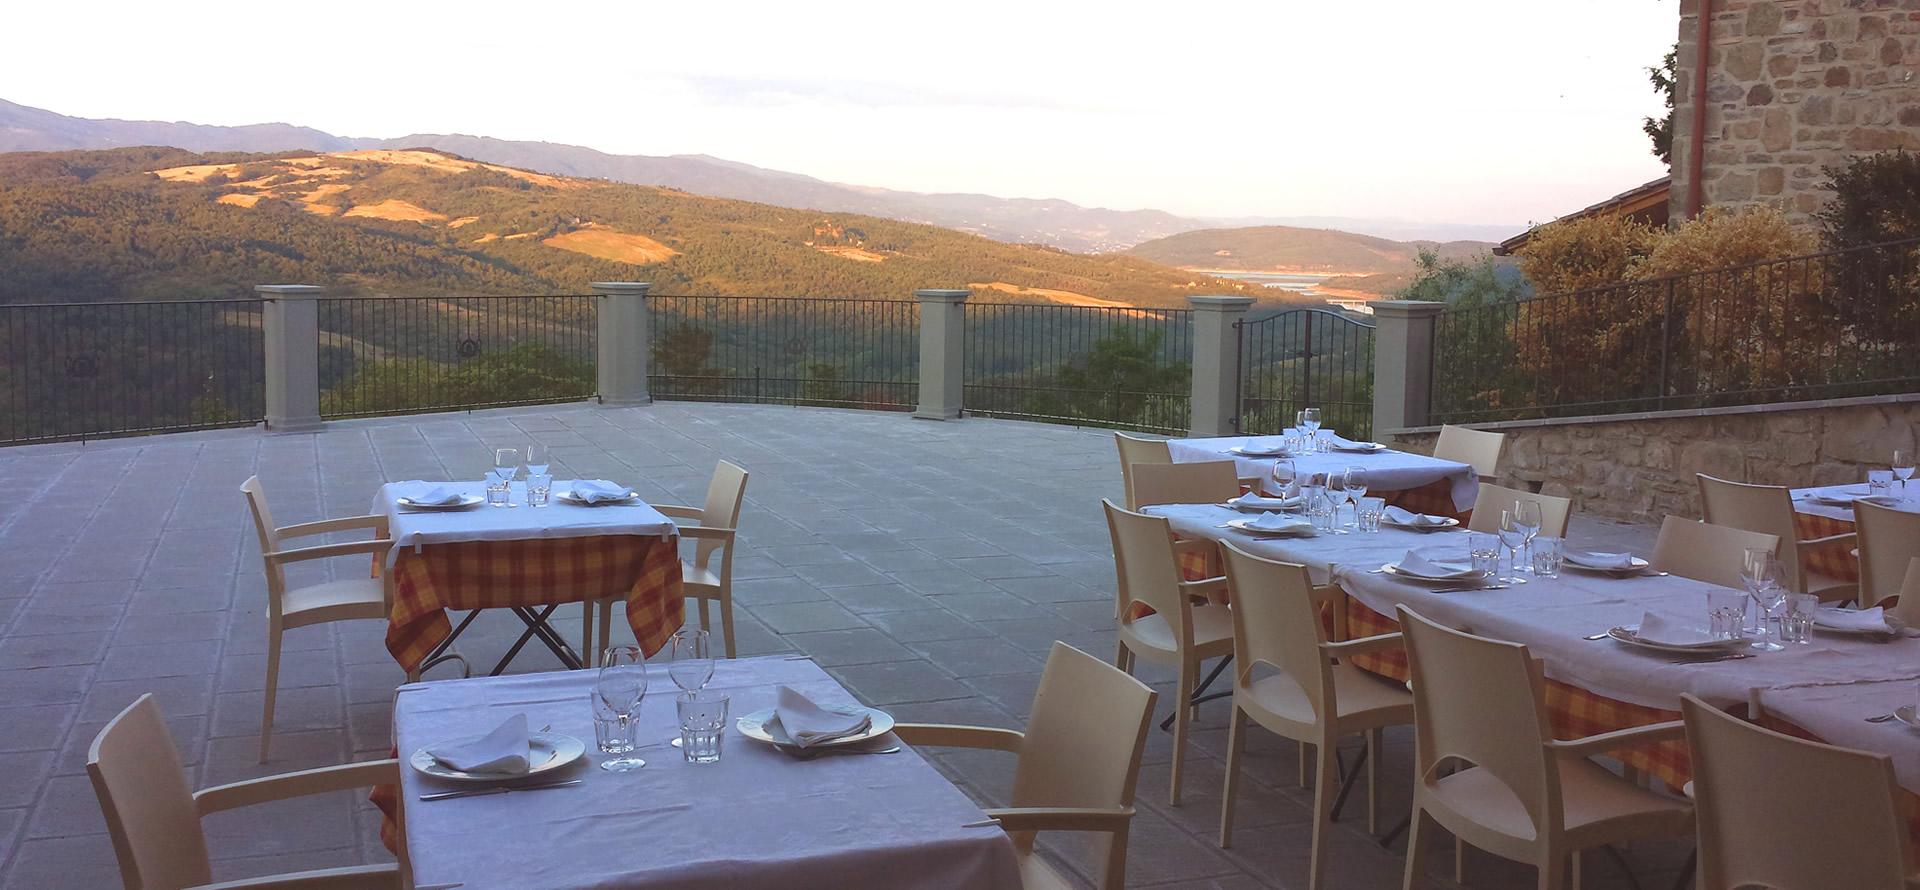 Terrazza Panoramica a Caprese Michelangelo